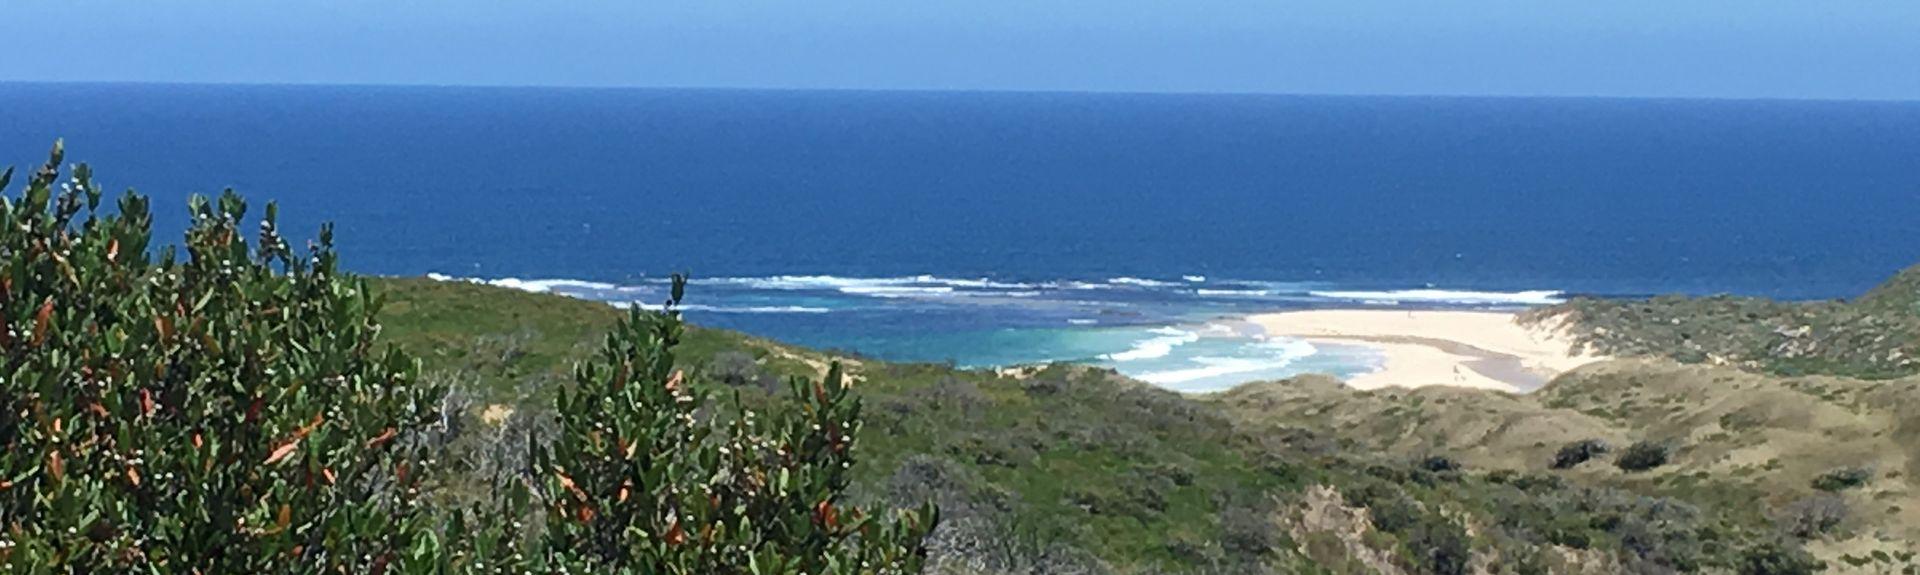 Bramley, Western Australia, Australia